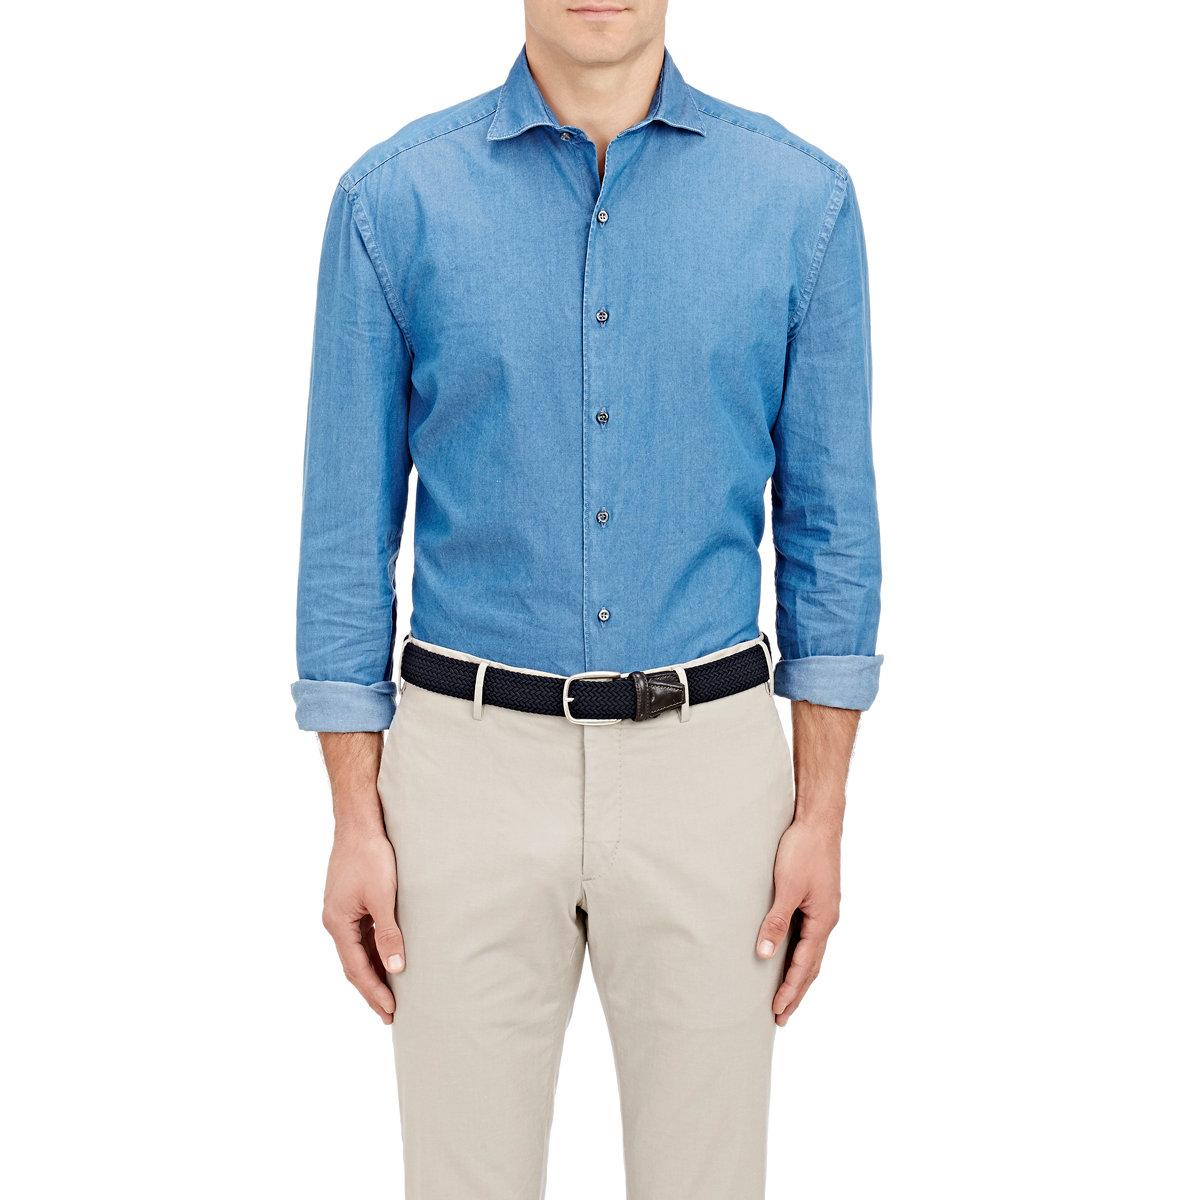 barneys new york chambray dress shirt in blue for men lyst